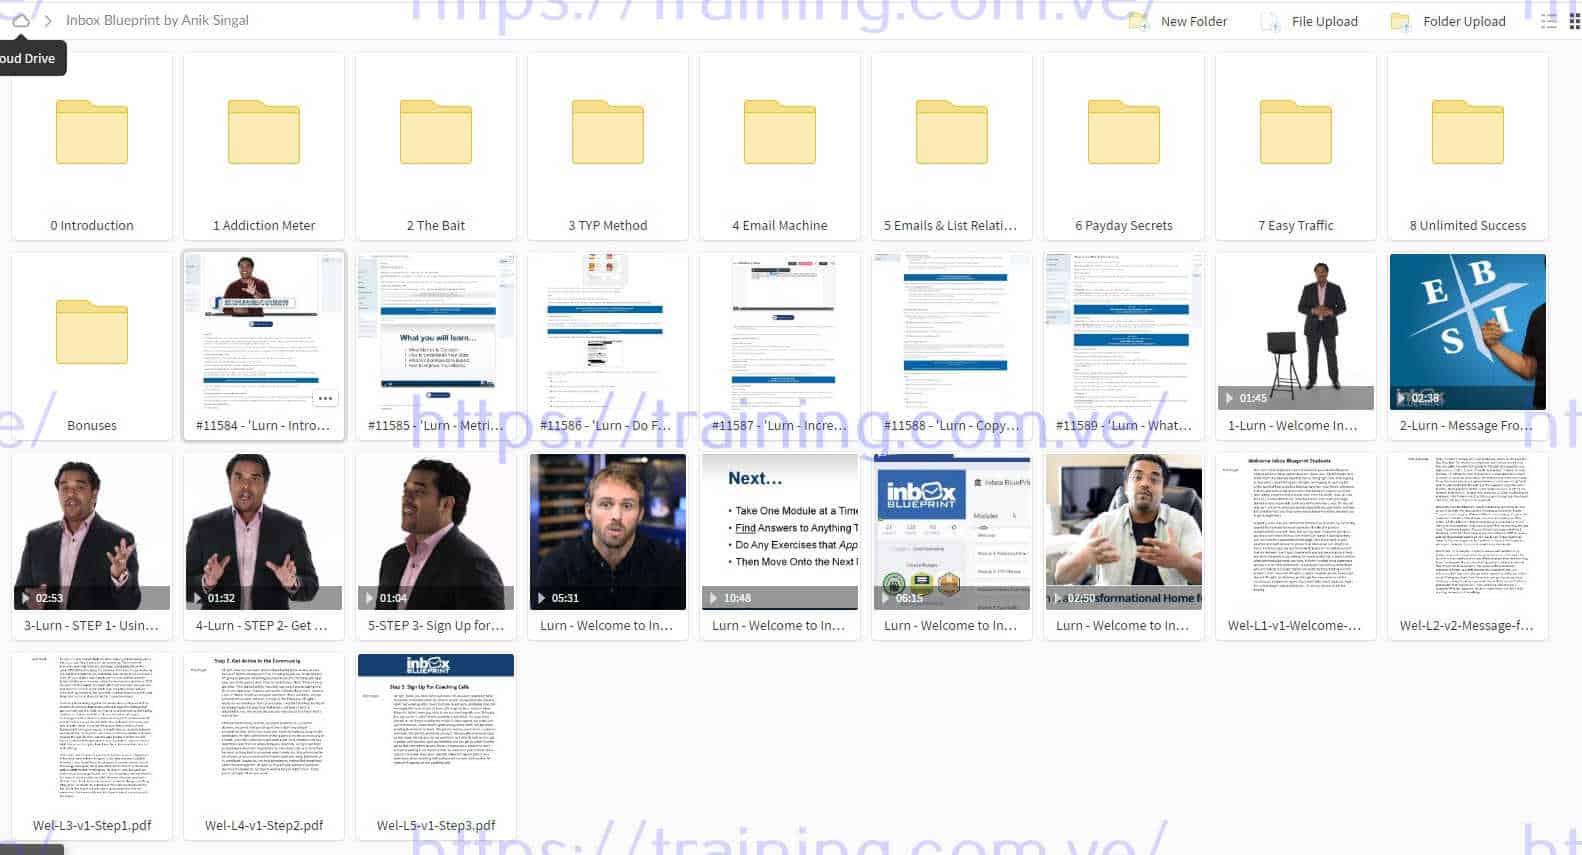 Inbox Blueprint by Anik Singal Torrent